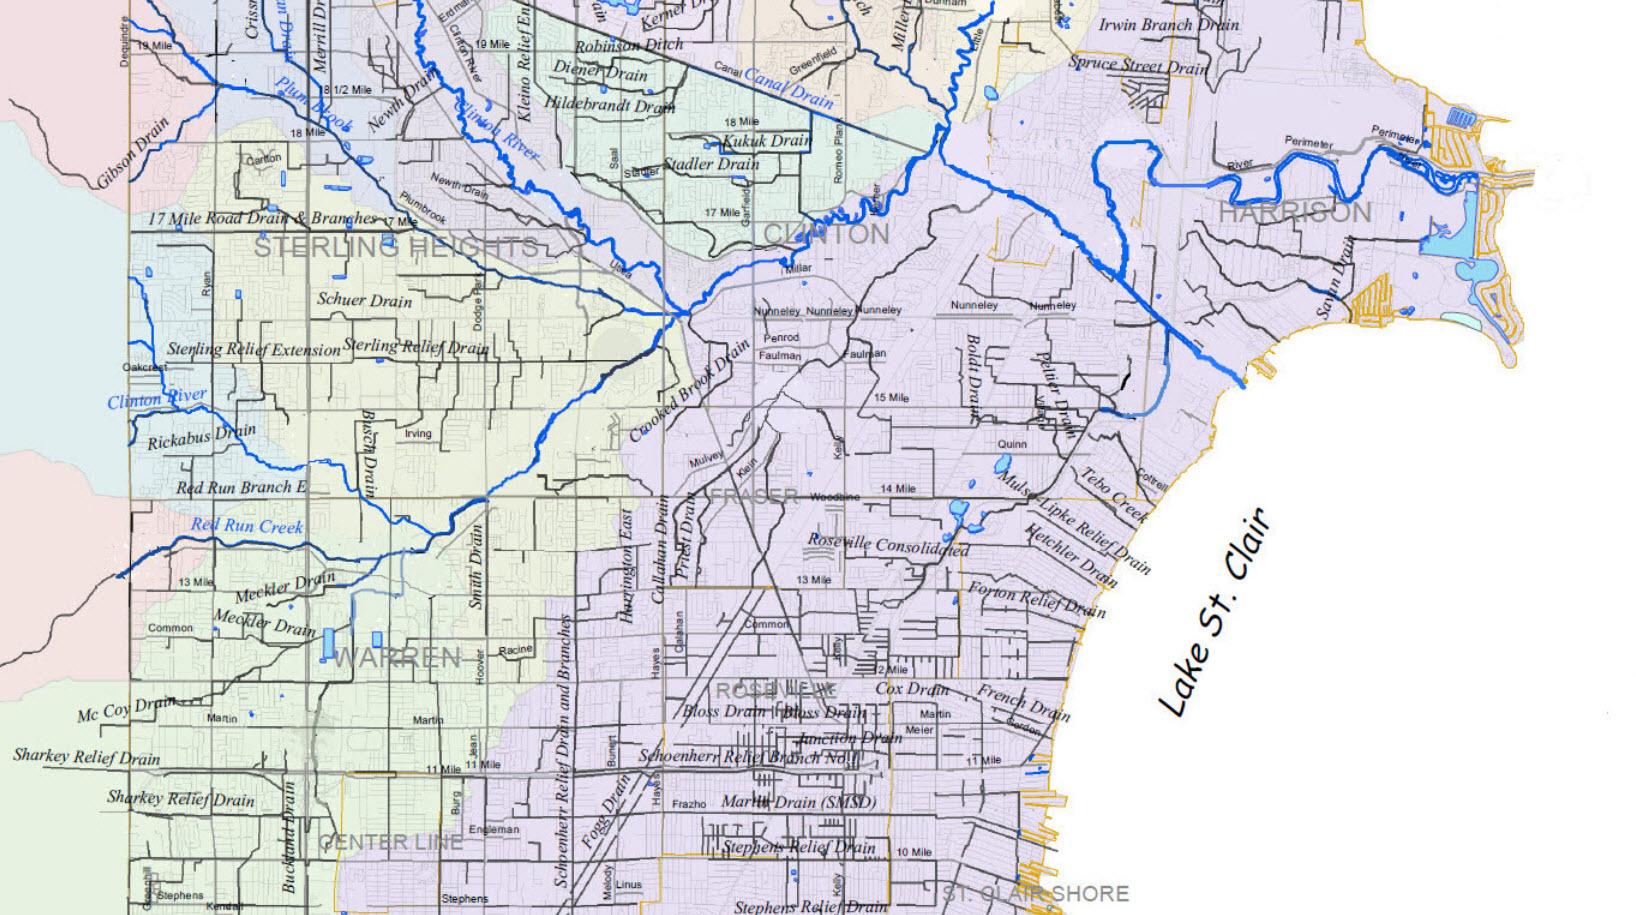 Warren Macomb And Gis Drain Maps Red Run